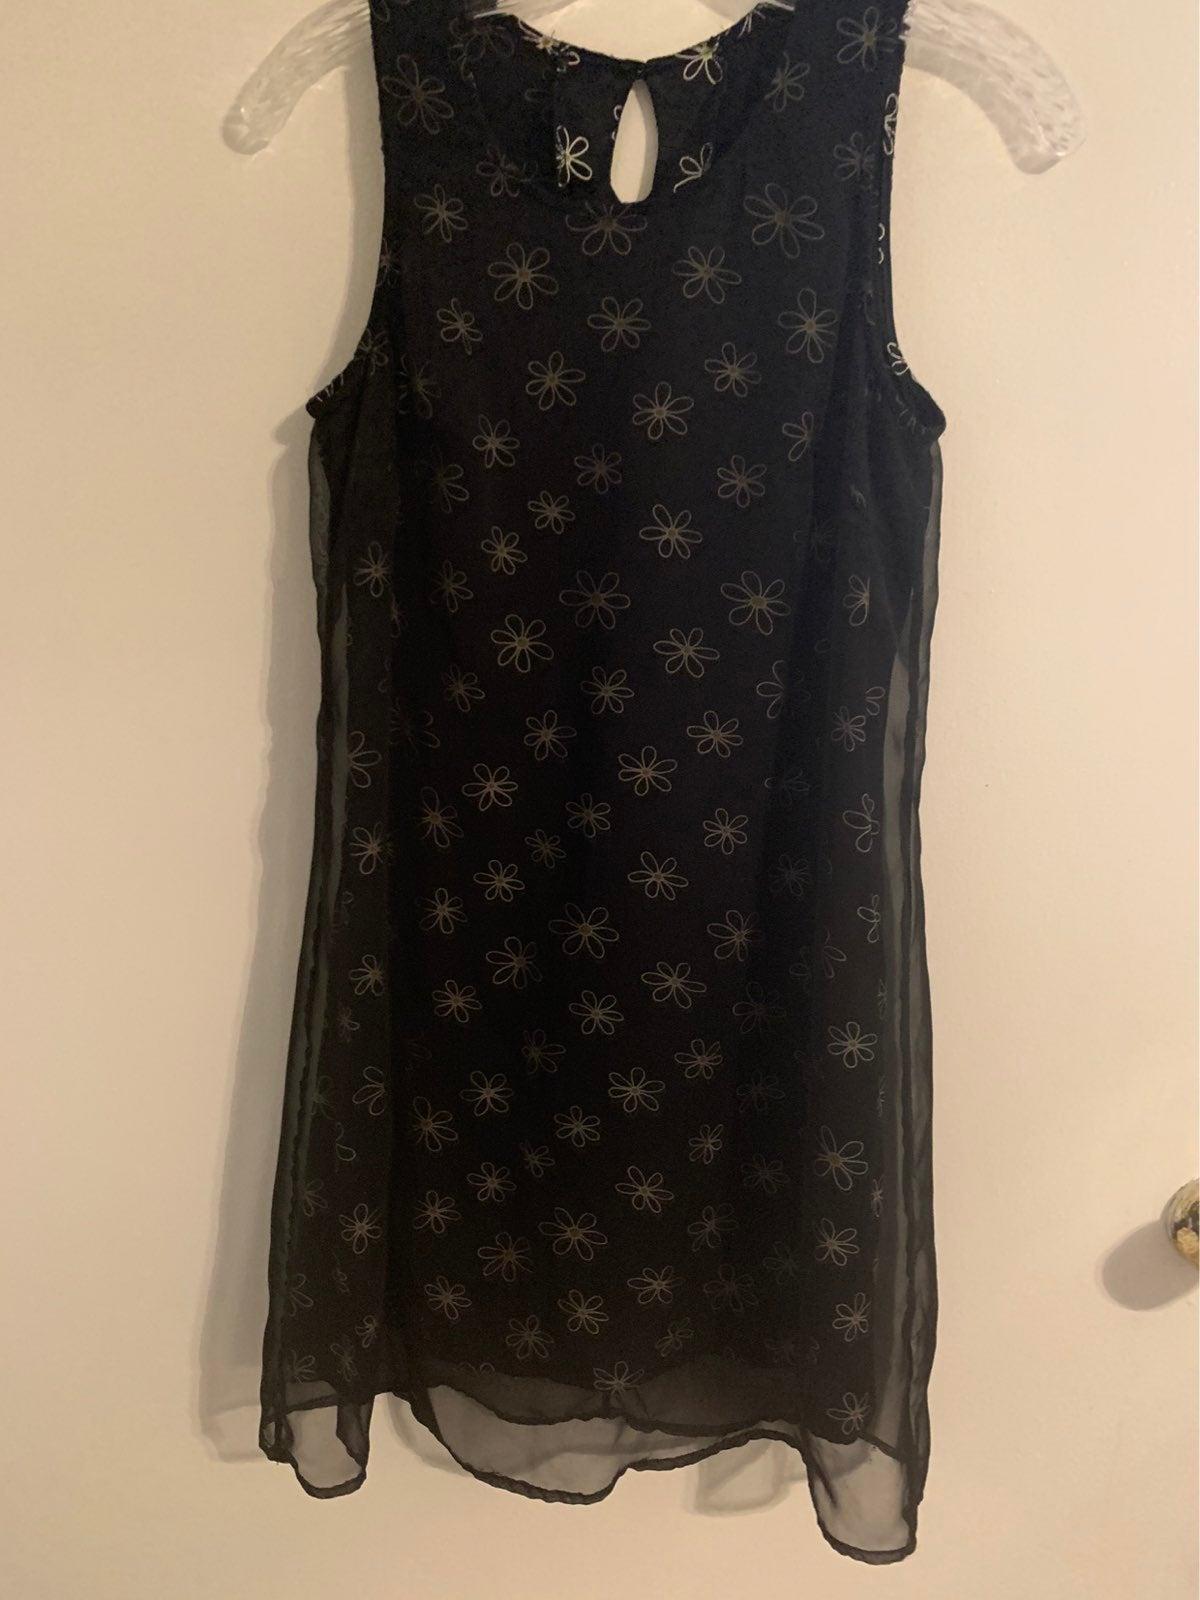 BYER TOO! Size 7 Black Knee Length Dress